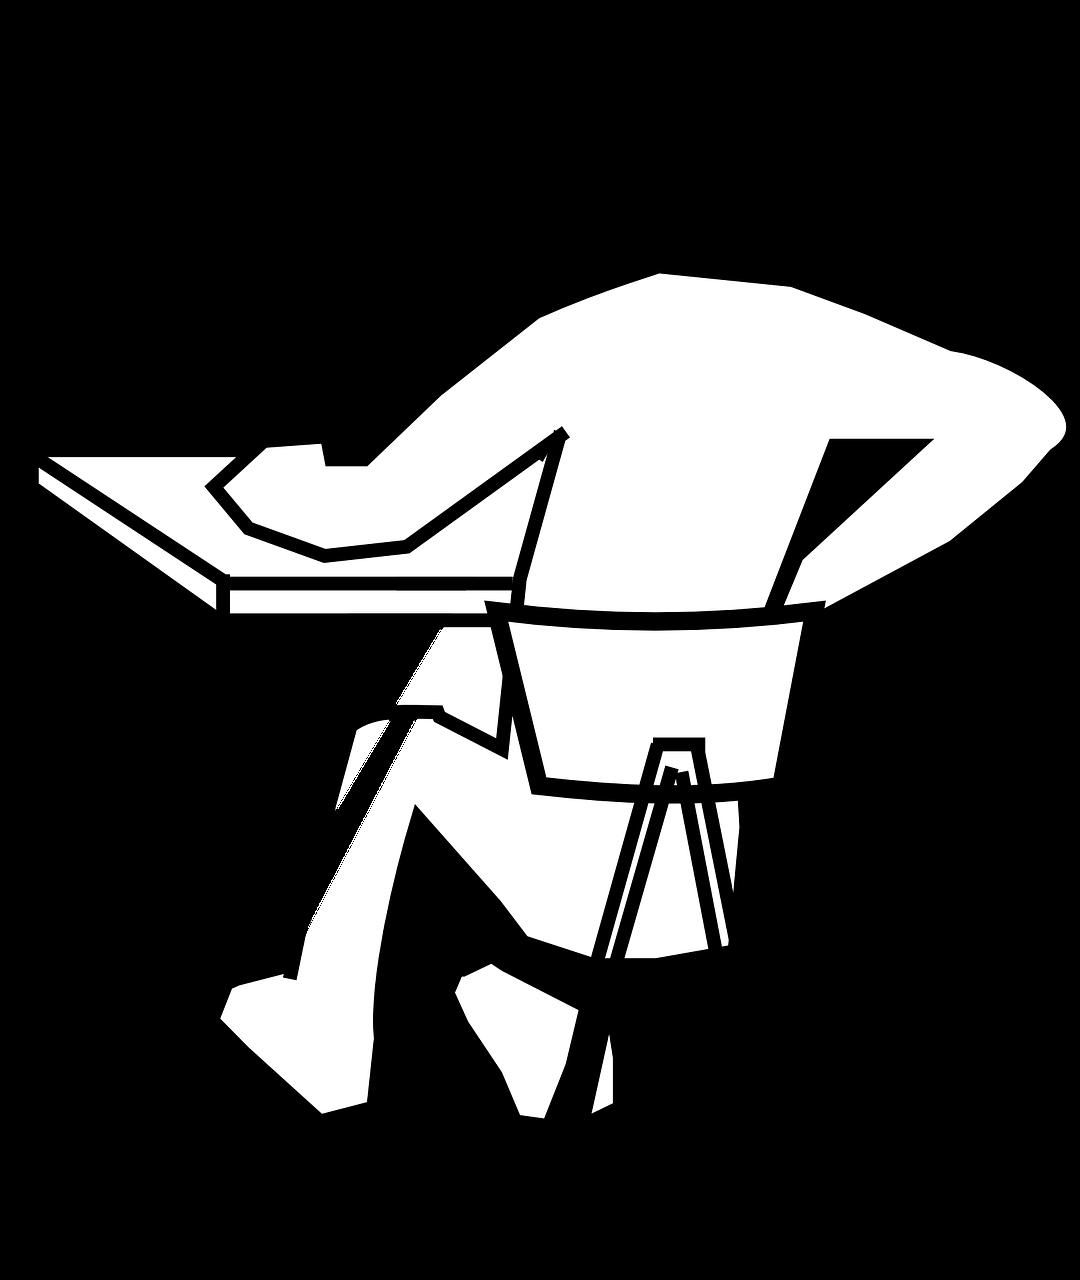 sitting pain image